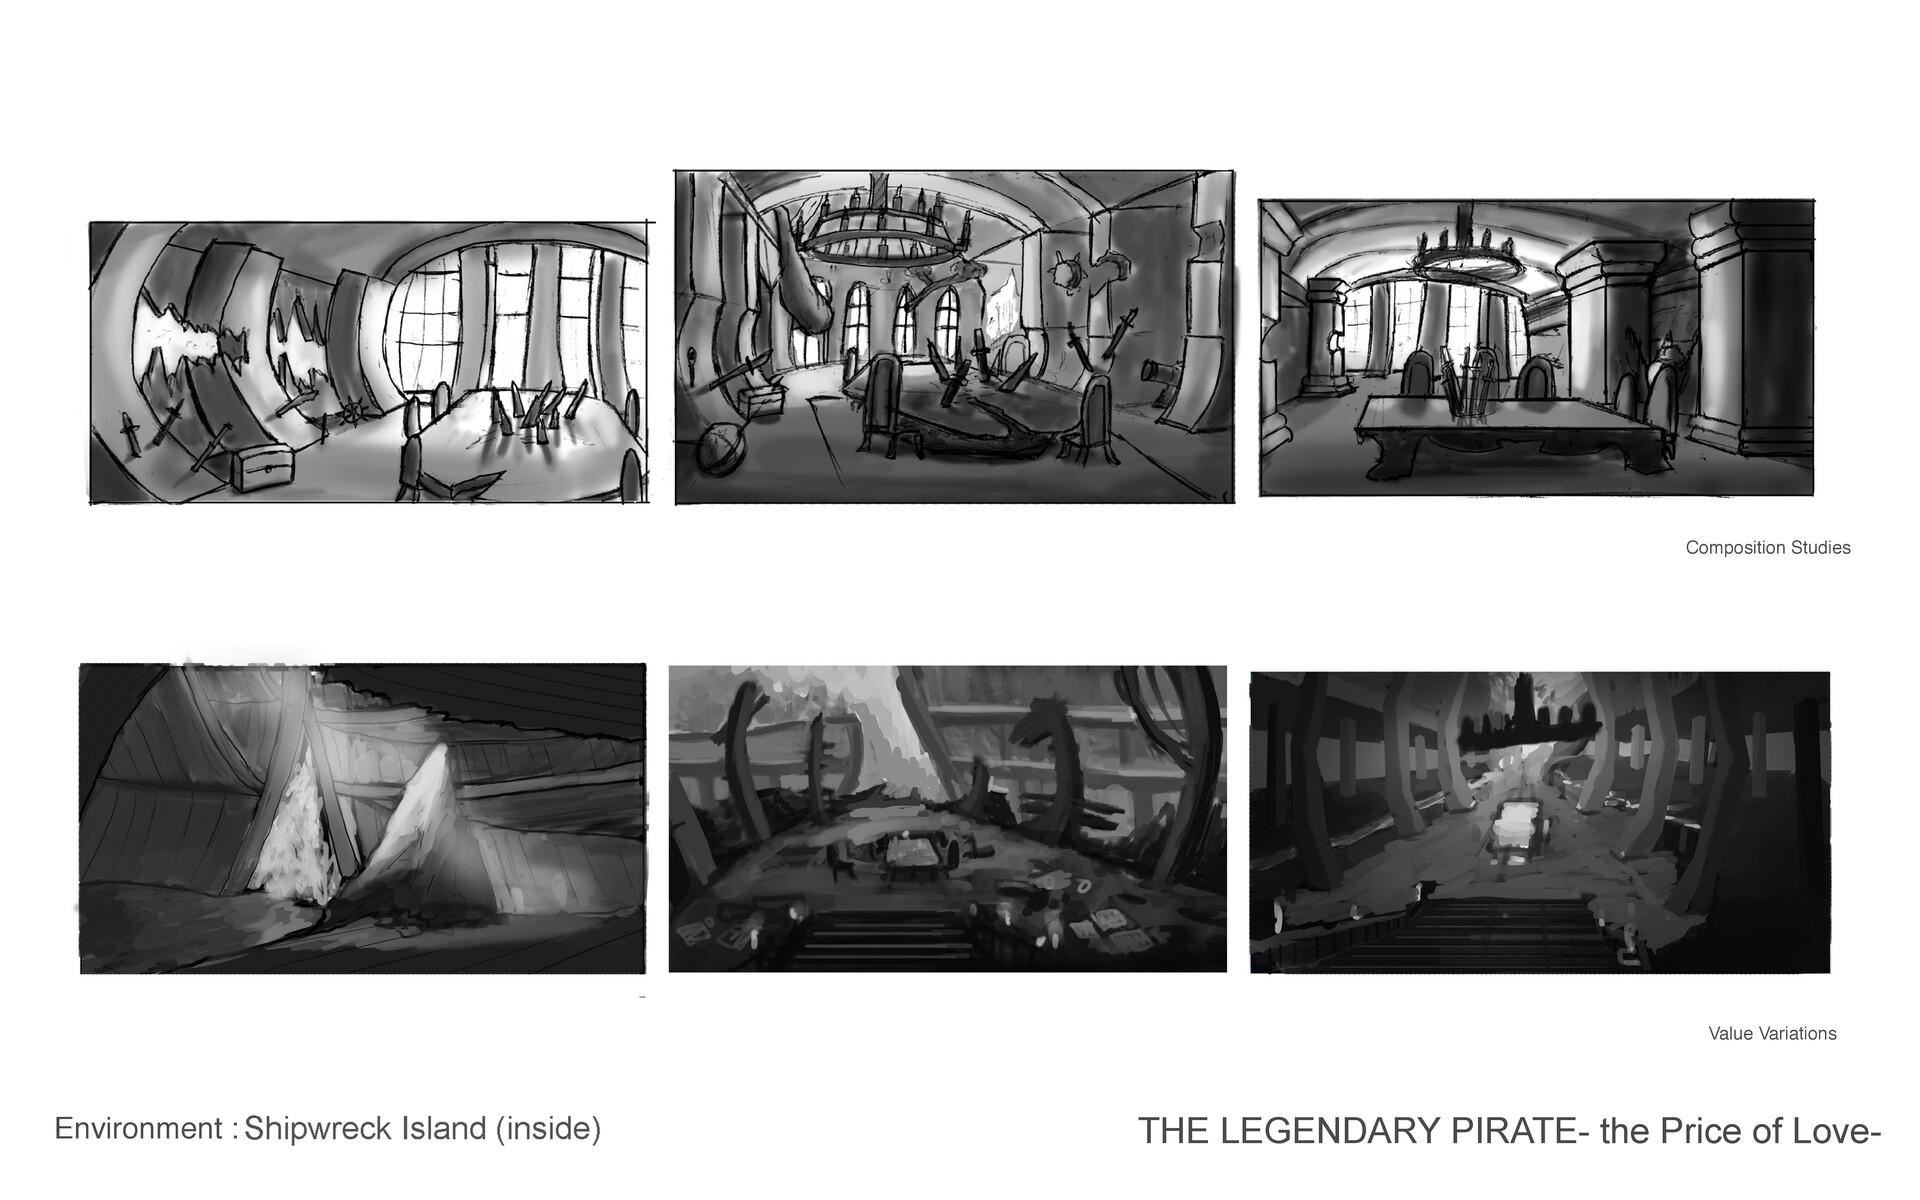 Inside of Shipwreck Island (Study)